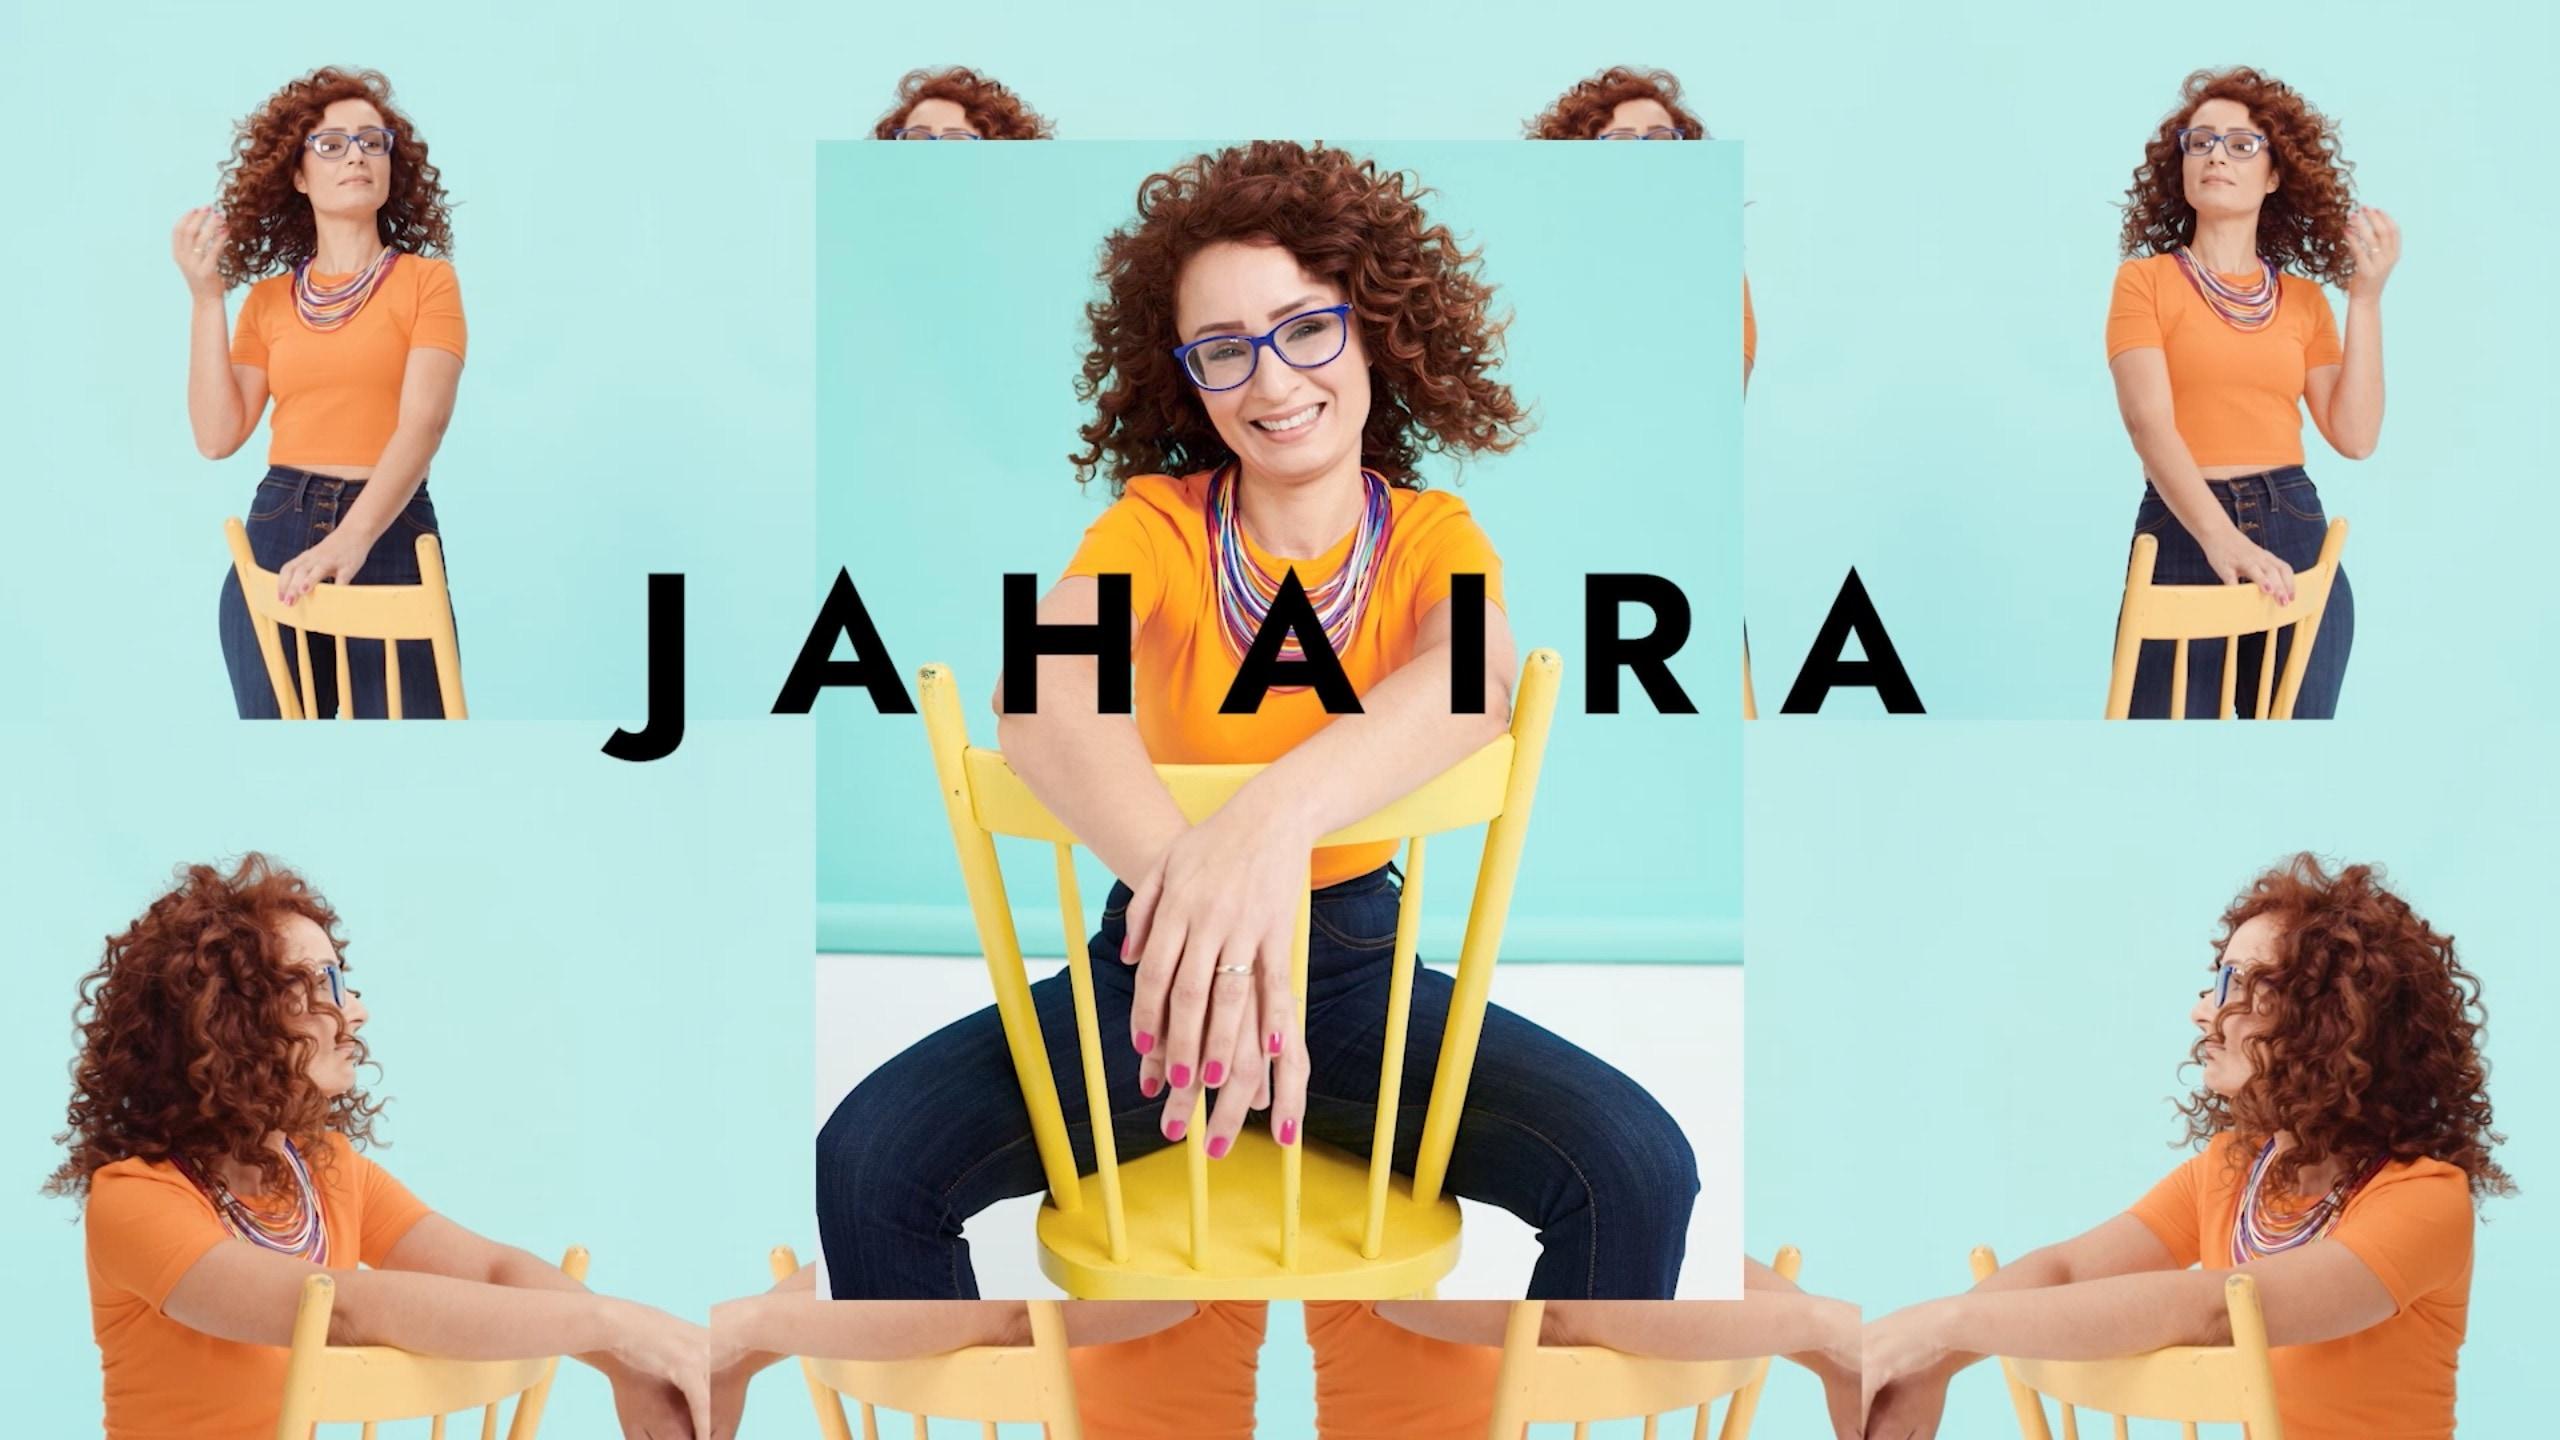 Watch Jahaira Hernandez discuss Hispanic Heritage Month